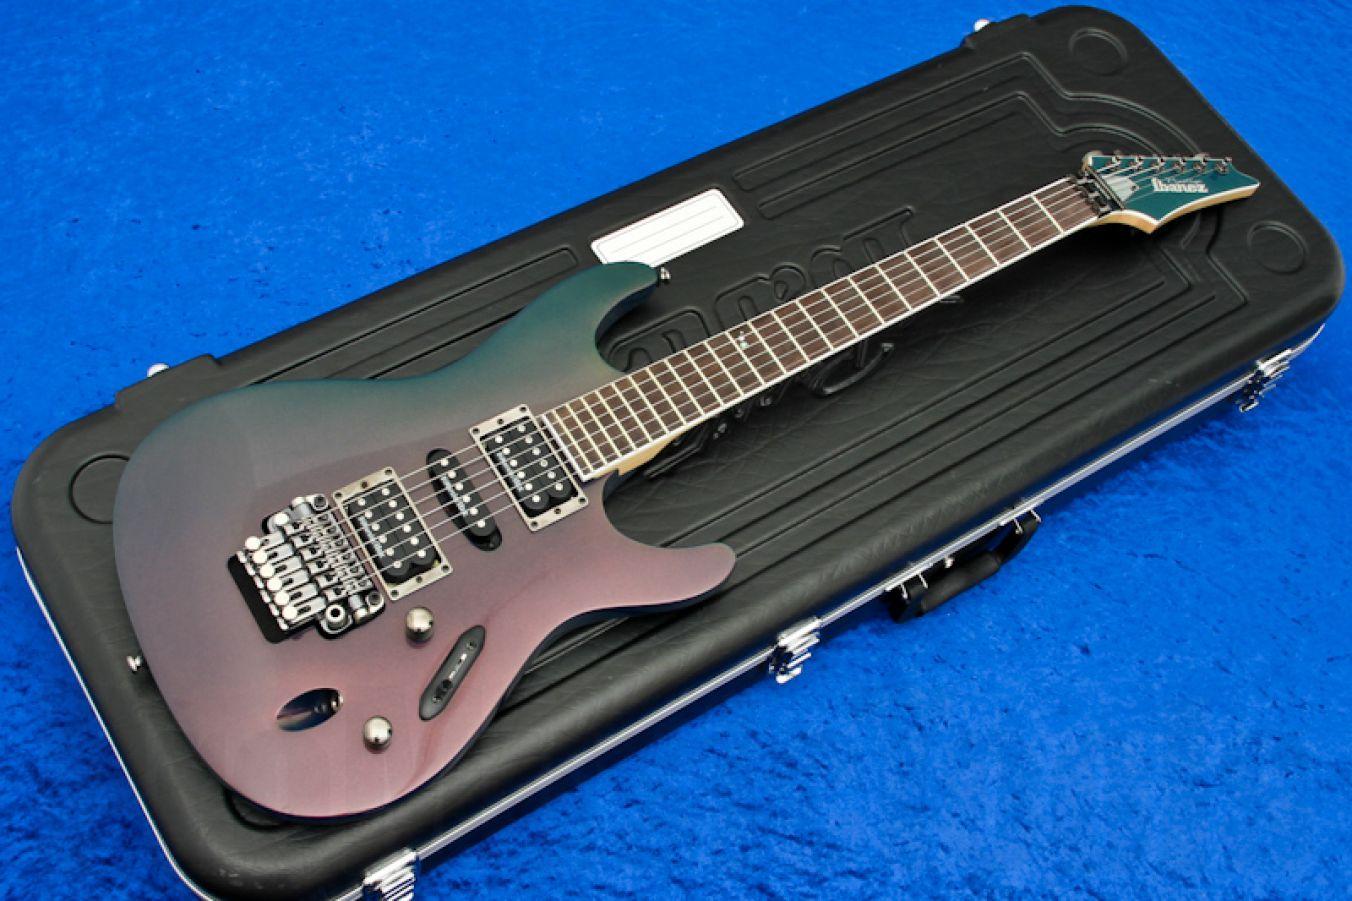 Ibanez S2170 PCM Prestige - Purple Chameleon